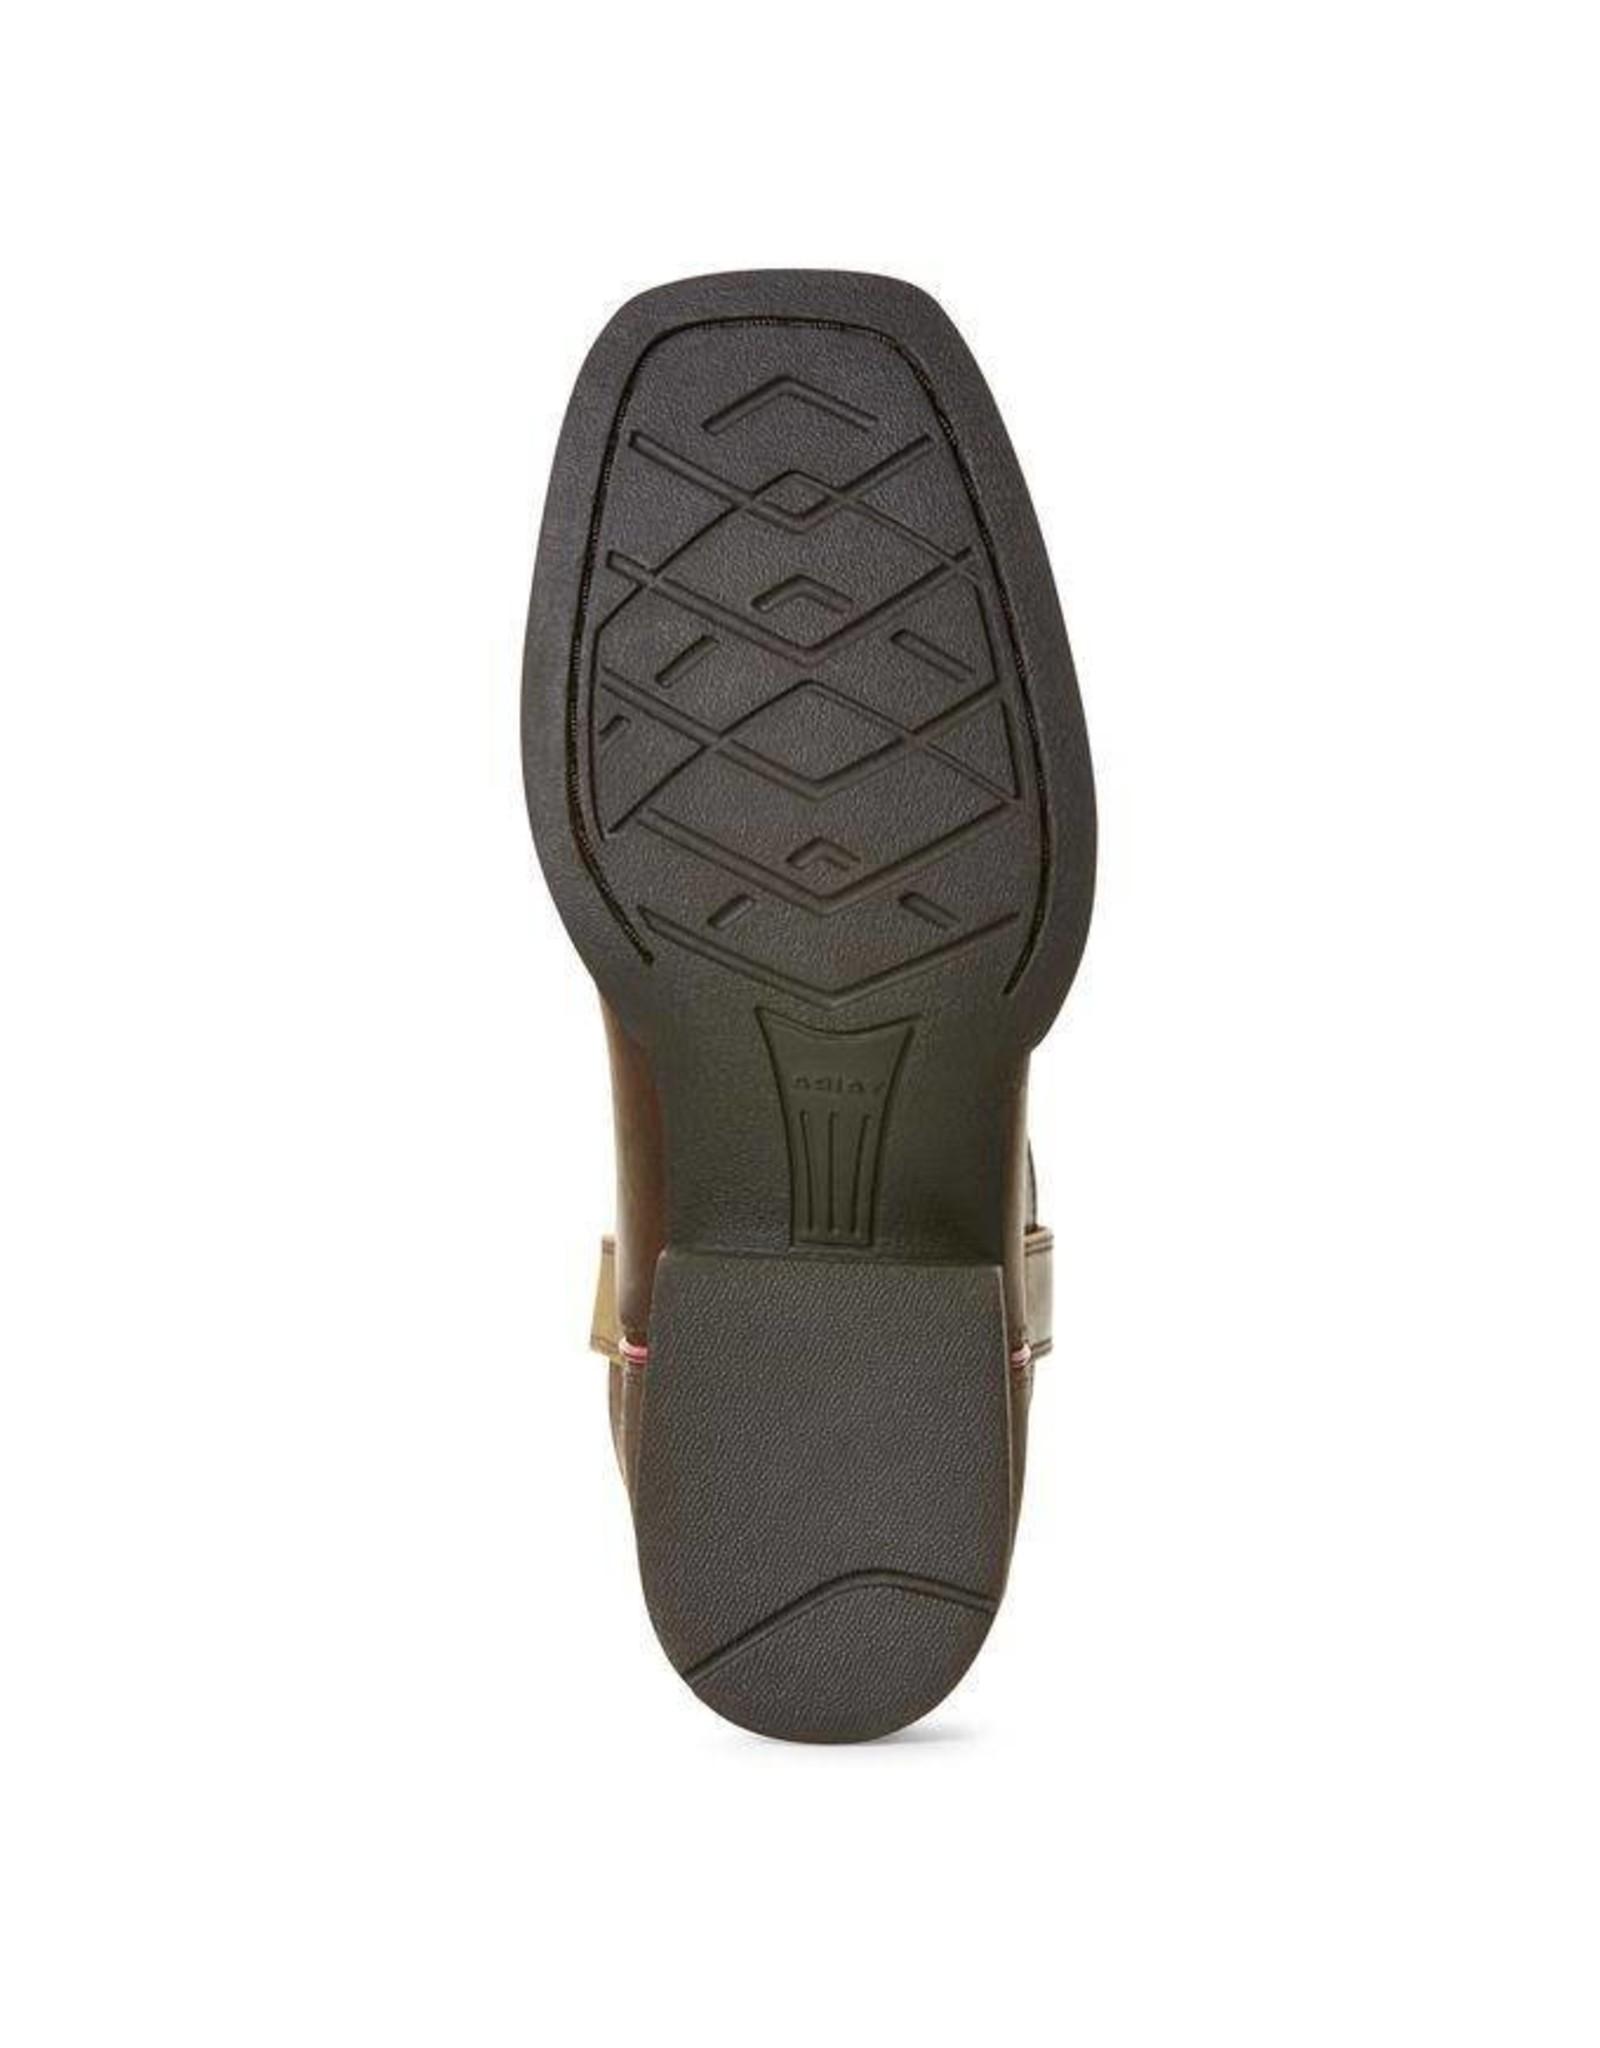 Boots-Children Ariat 10027304  Quickdraw VentTEK